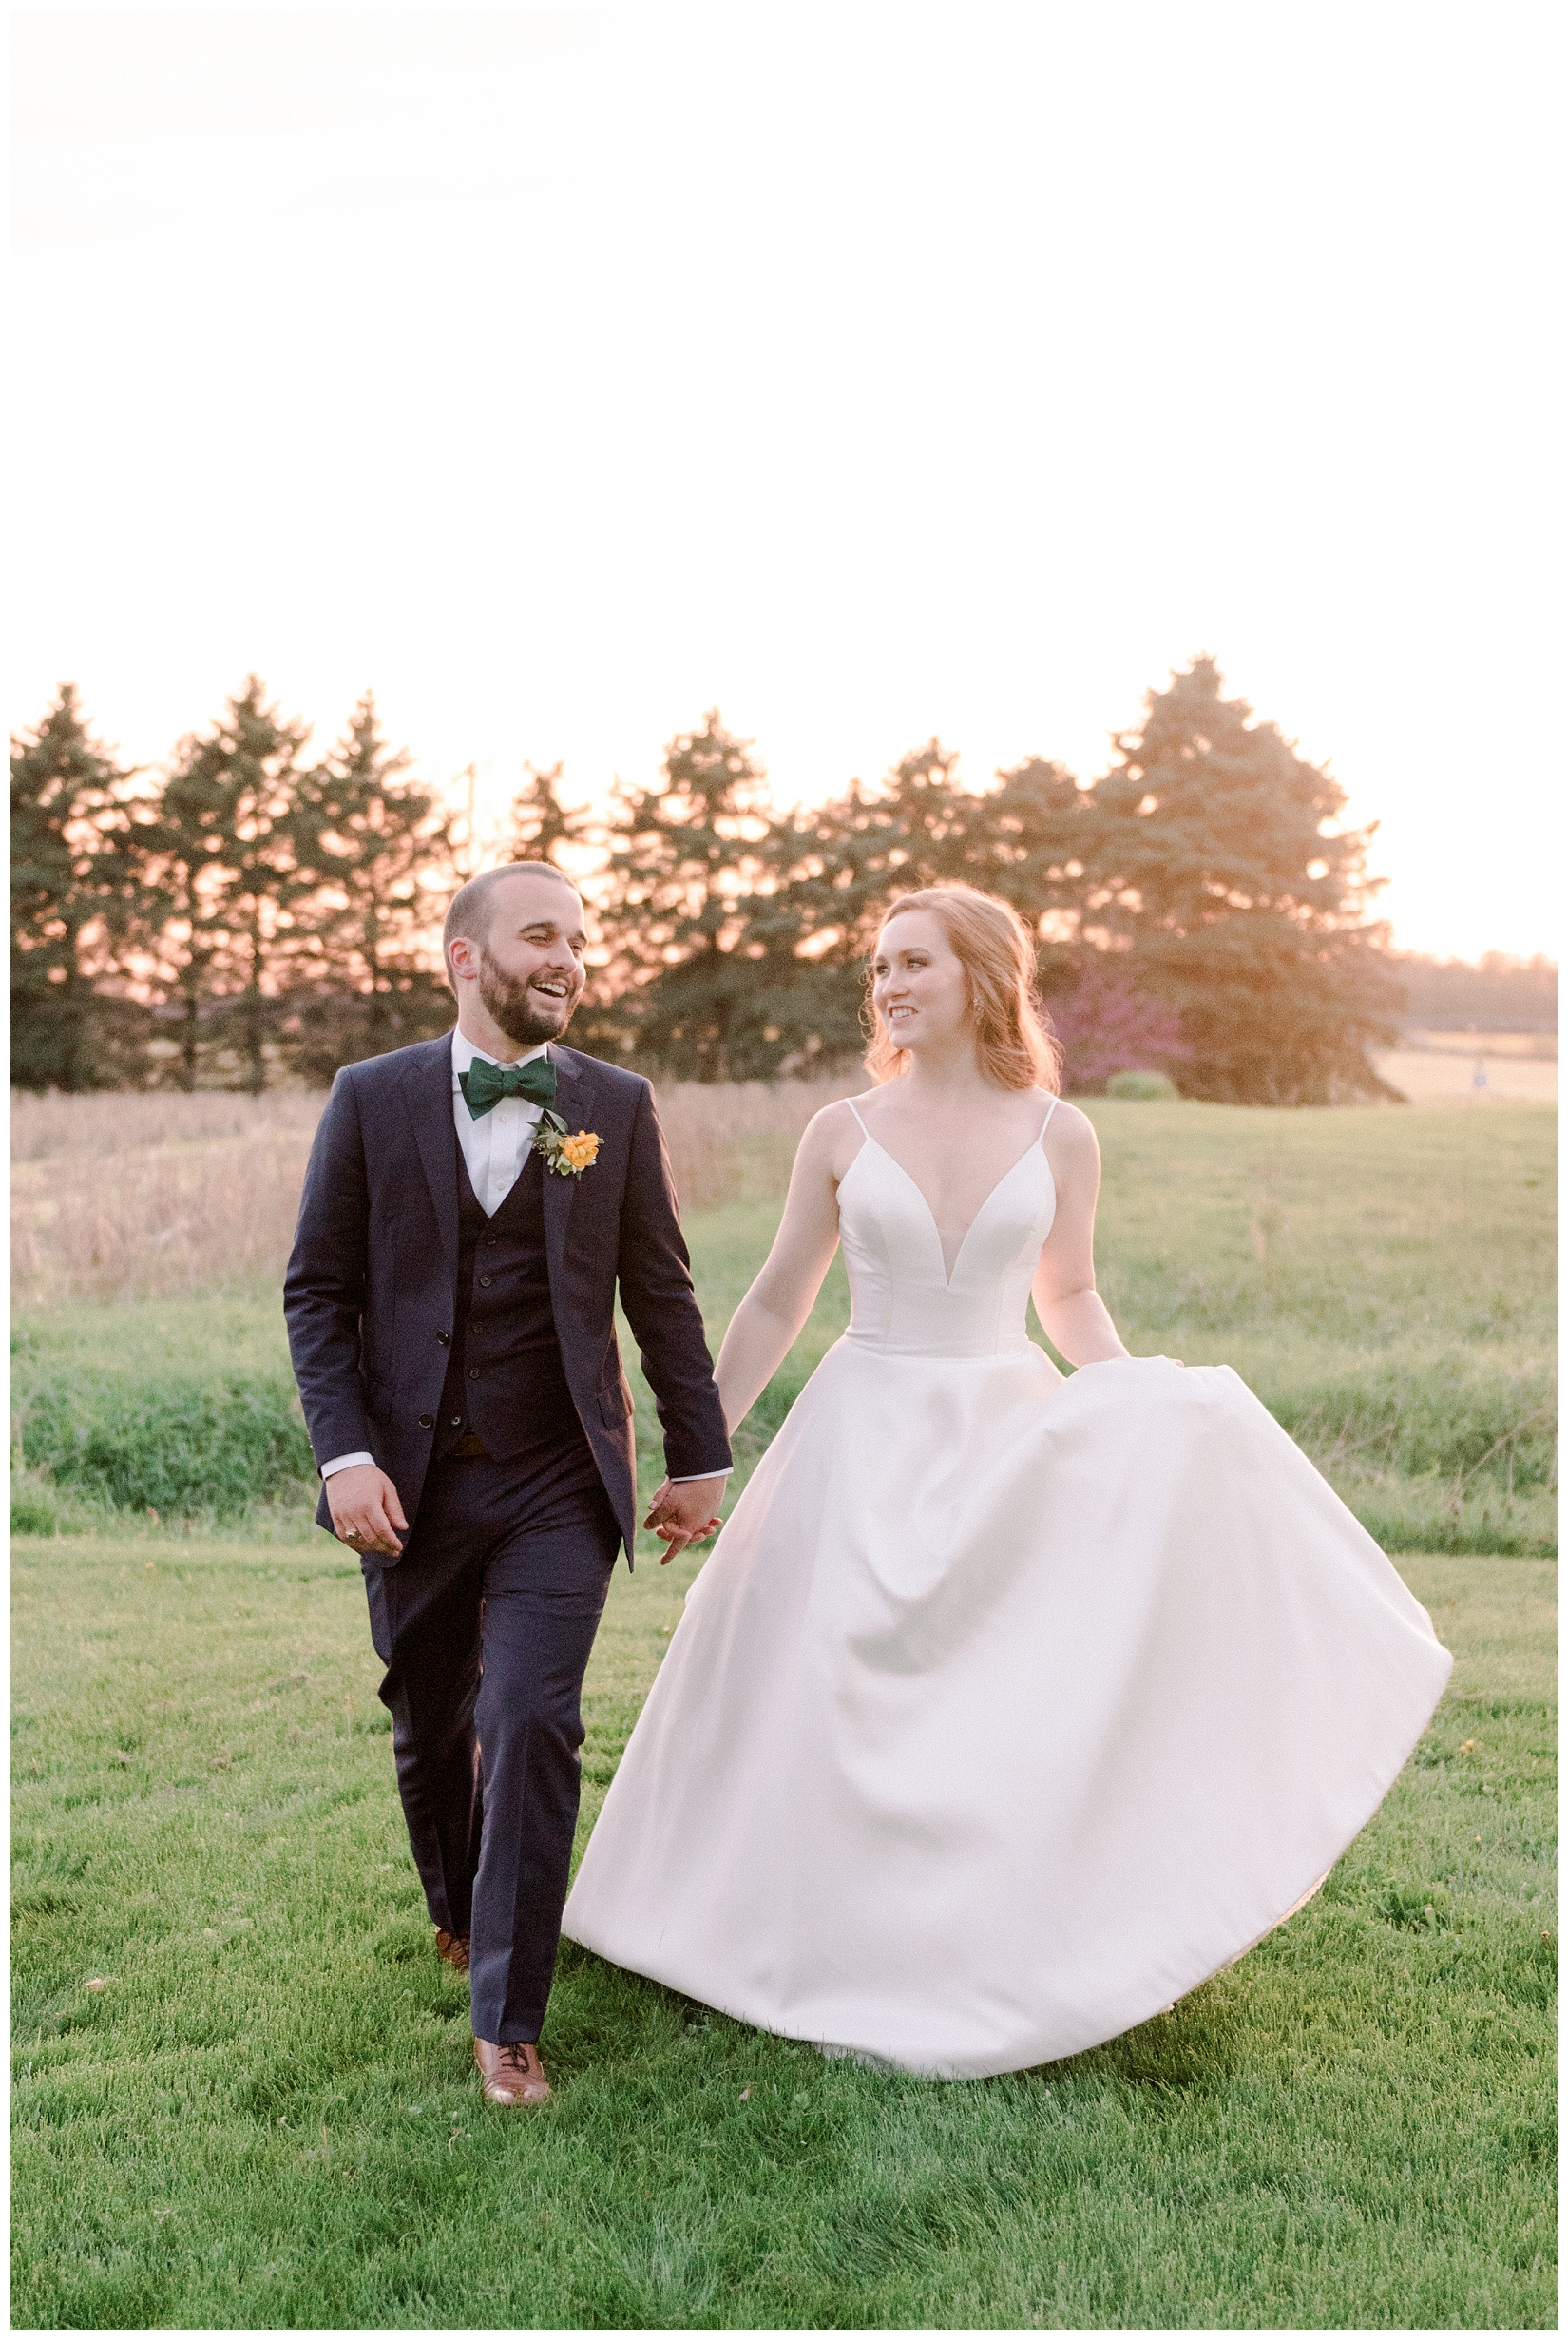 cat-alkire-wedding-photographer-indiana-chicago-indianapolis-fort-wayne_1234.jpg